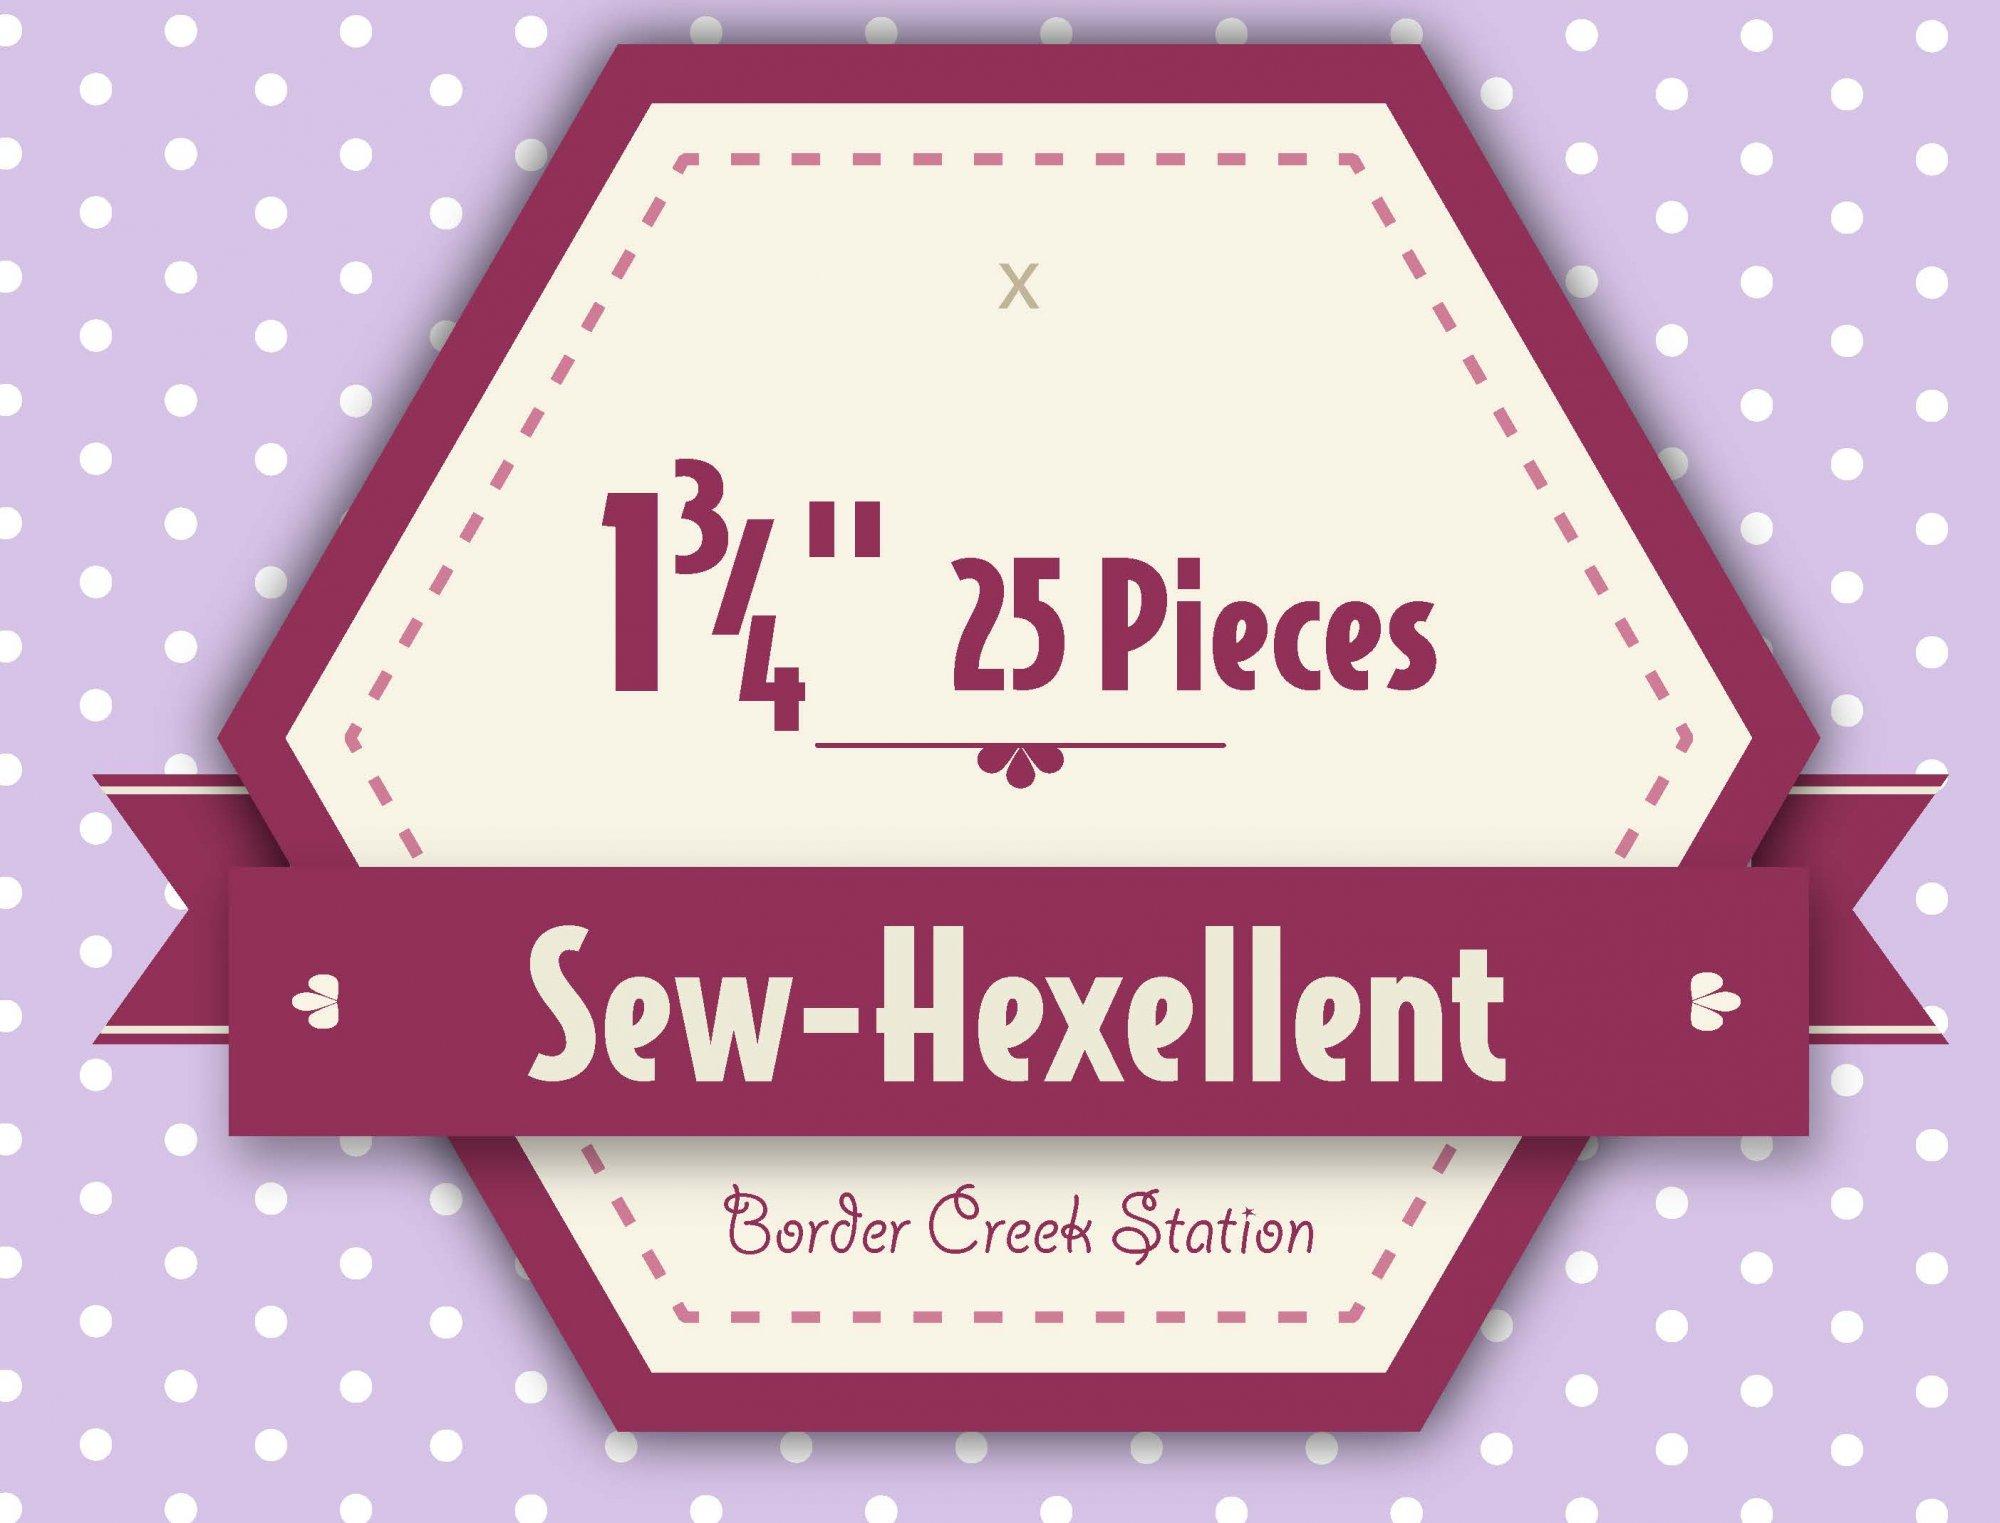 Sew-Hexellent 1-3/4 Templates